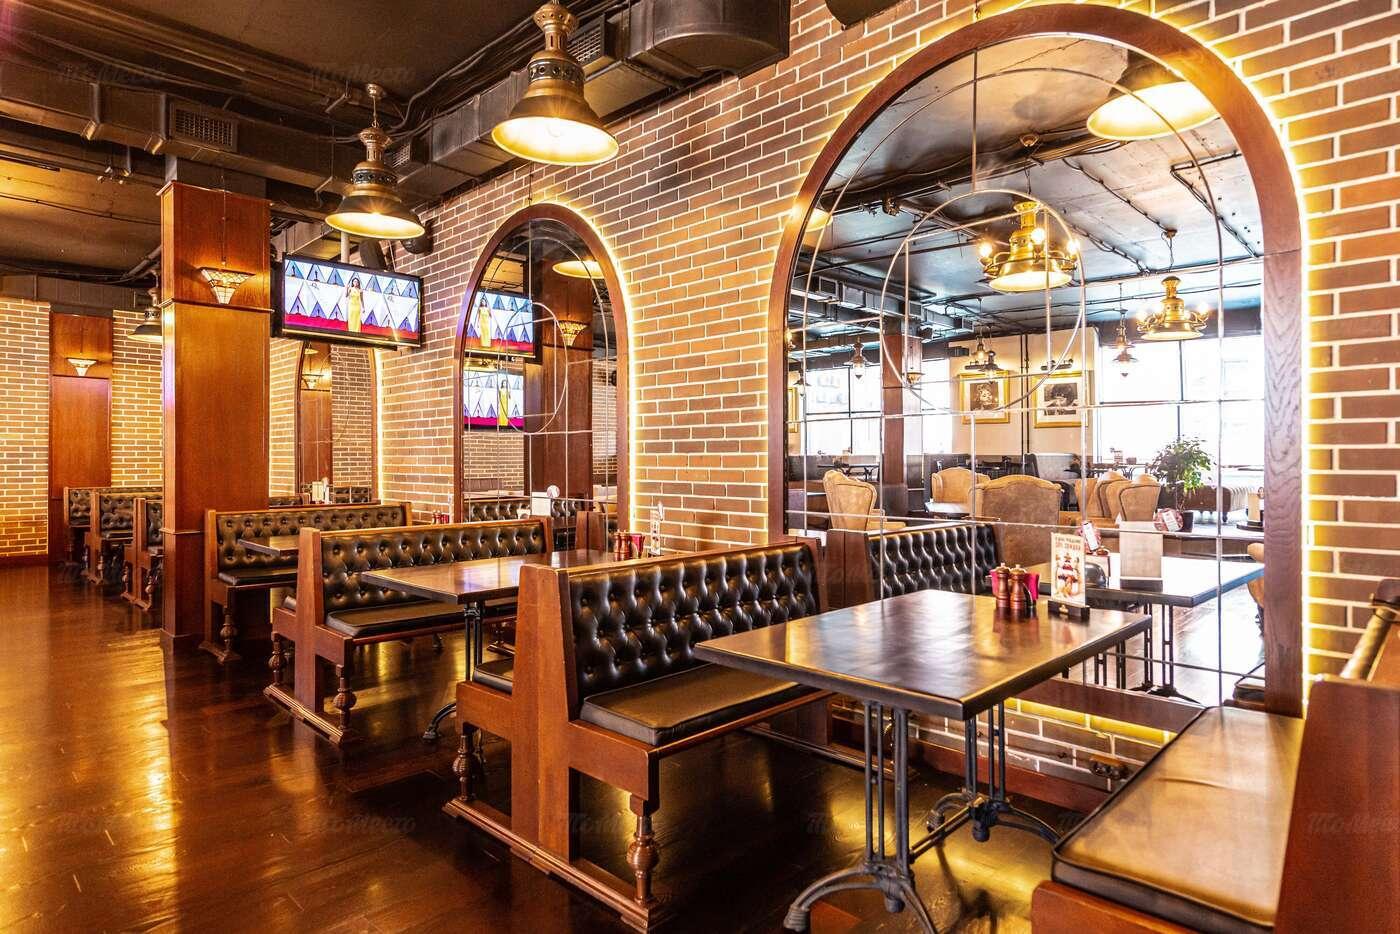 Ресторан Темпл Бар (Temple Bar) в Нижнем Сусальном переулке